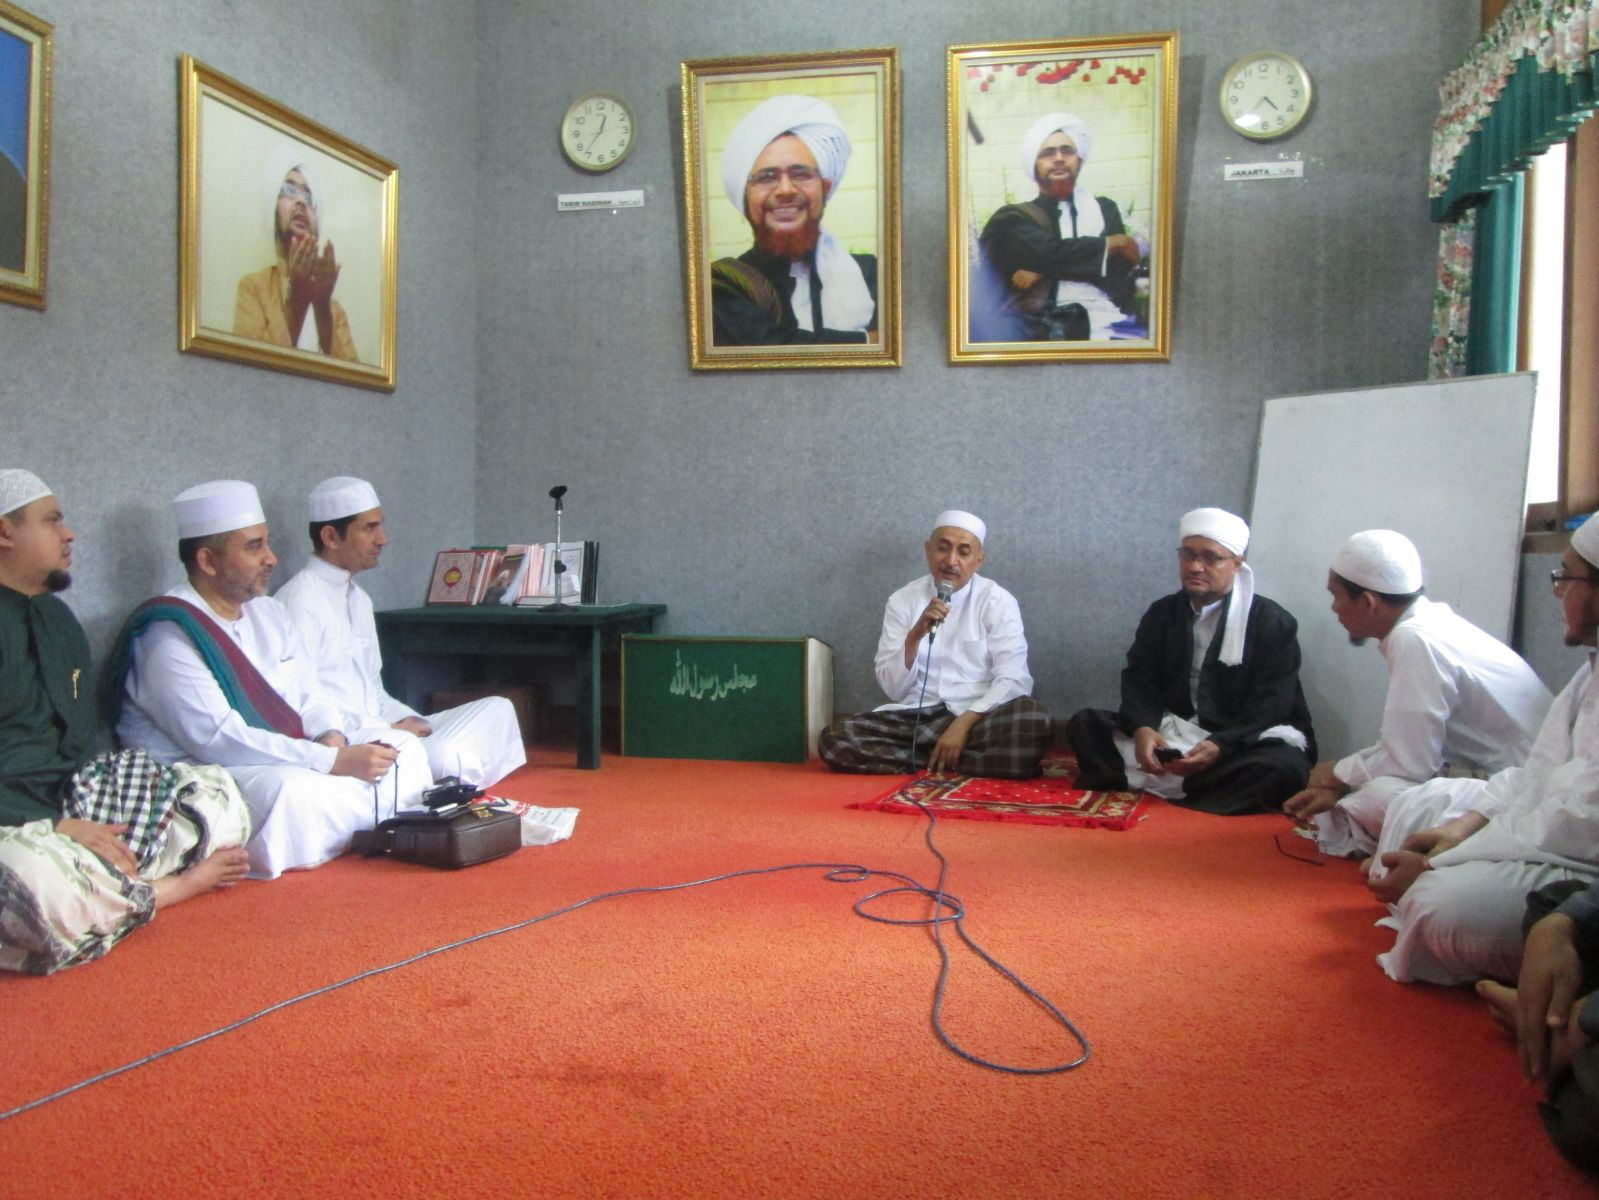 Keputusan Guru Mulia Habibana Umar bin Hafizh Tentang Majelis Rasulullah SAW